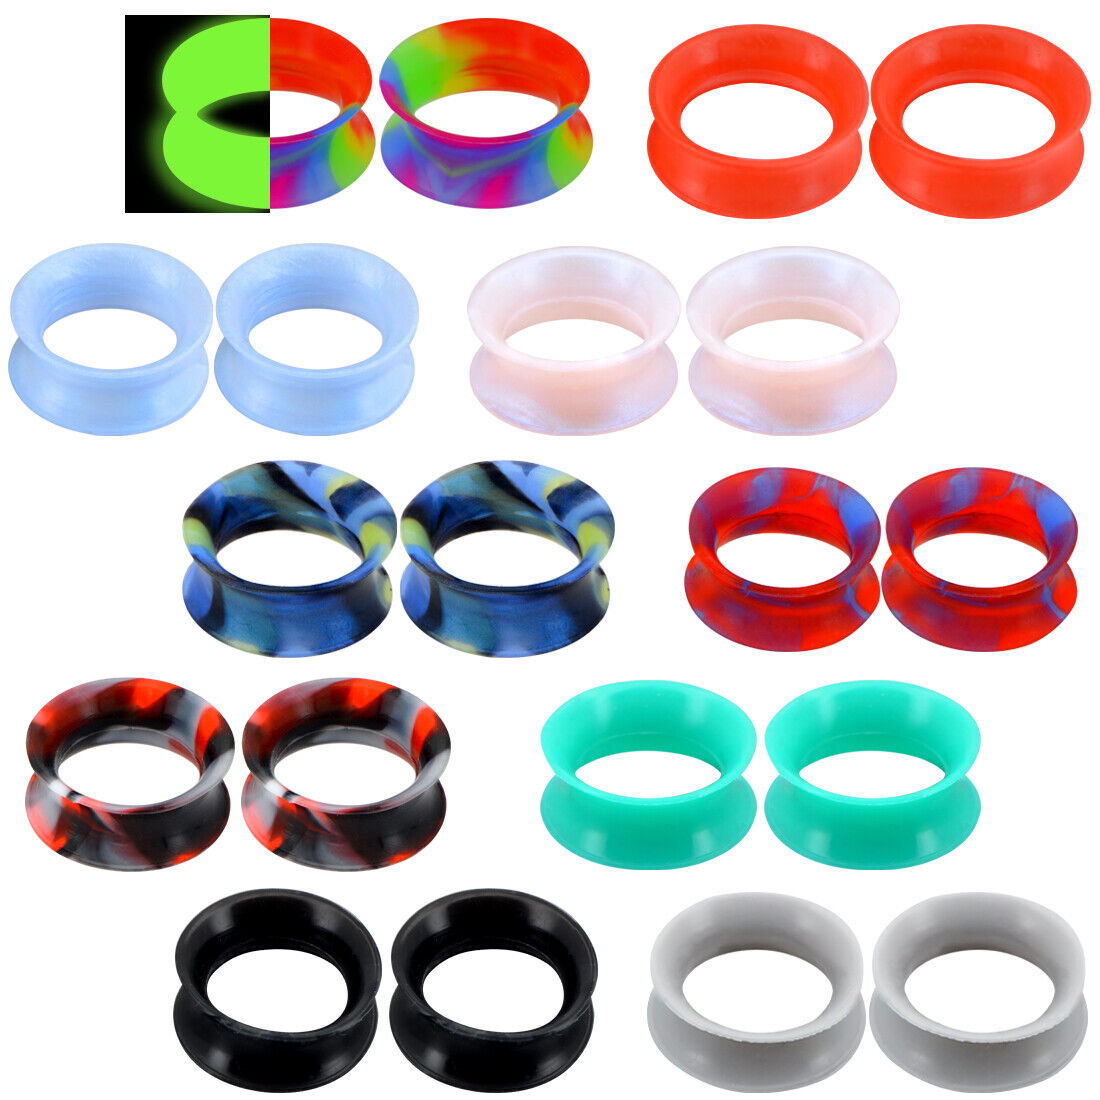 20pcs soft silicone ear gauges flesh tunnels